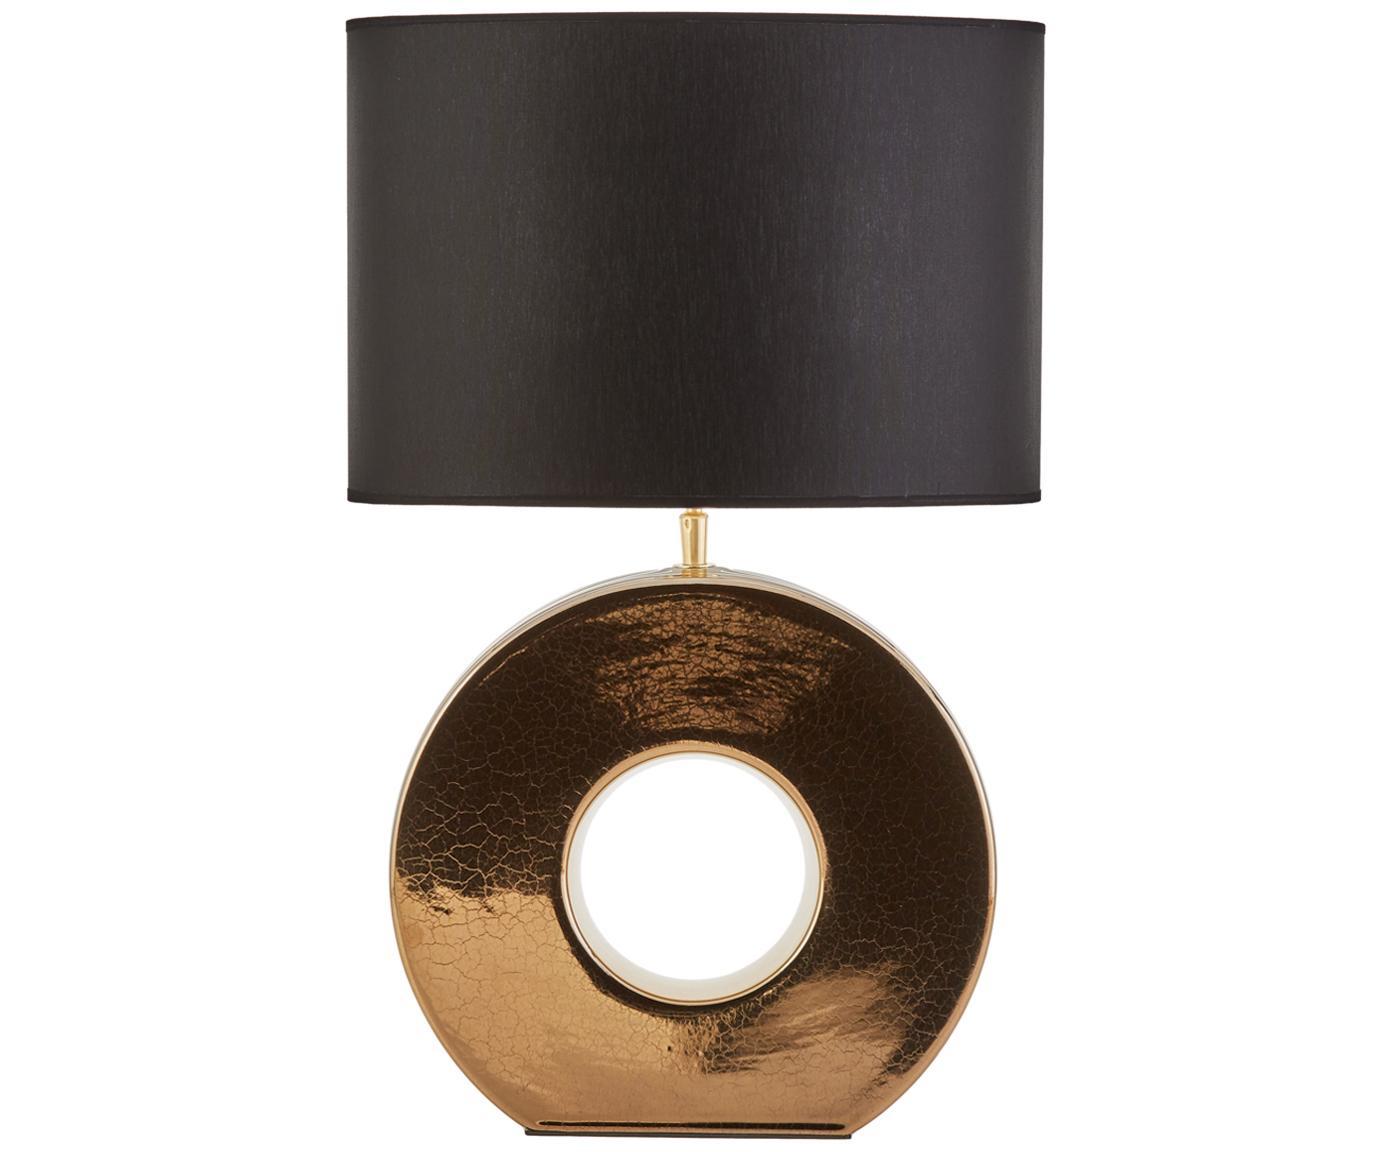 Keramik-Tischleuchte Aron, Lampenschirm: Polyester, Lampenfuß: Keramik, Goldfarben, Schwarz, 35 x 56 cm